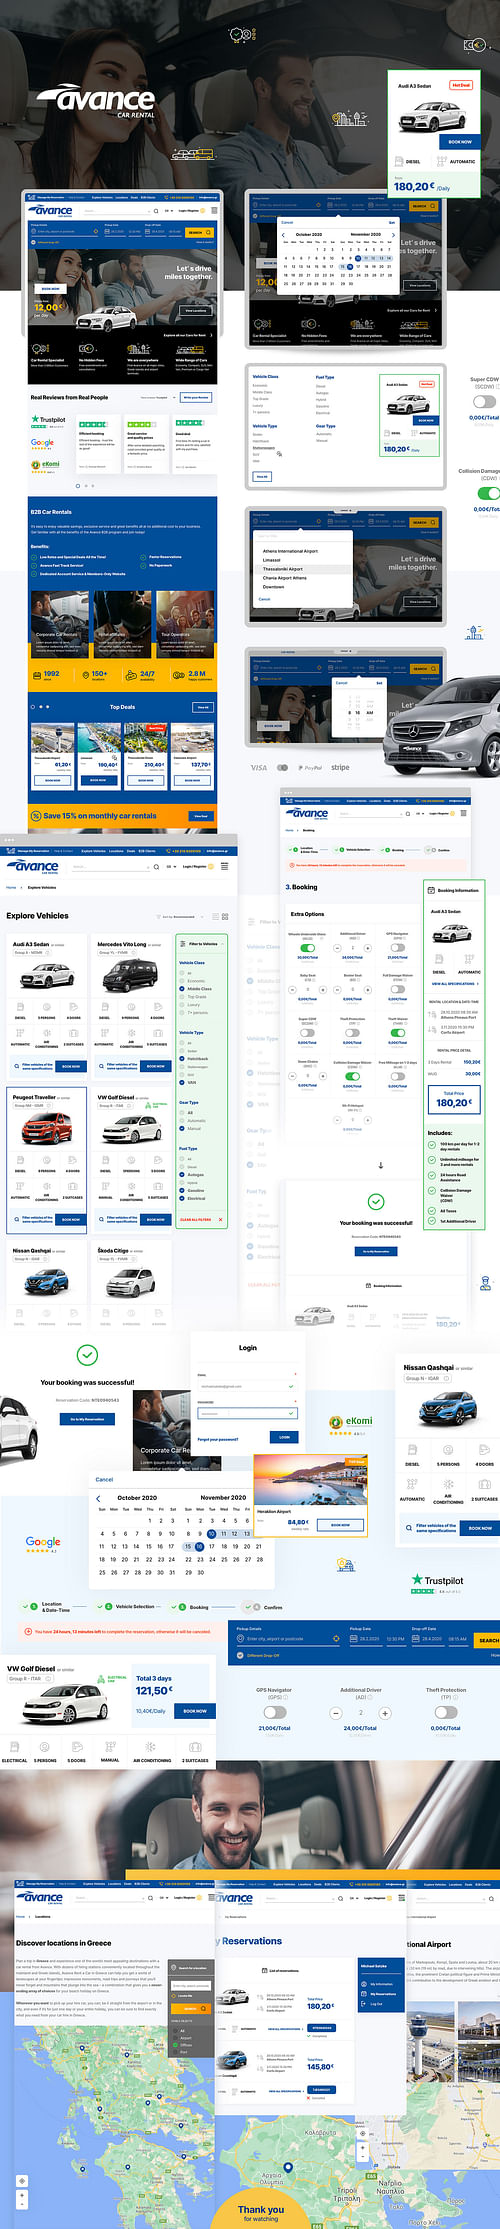 Avance Car Rental - Digital Strategy